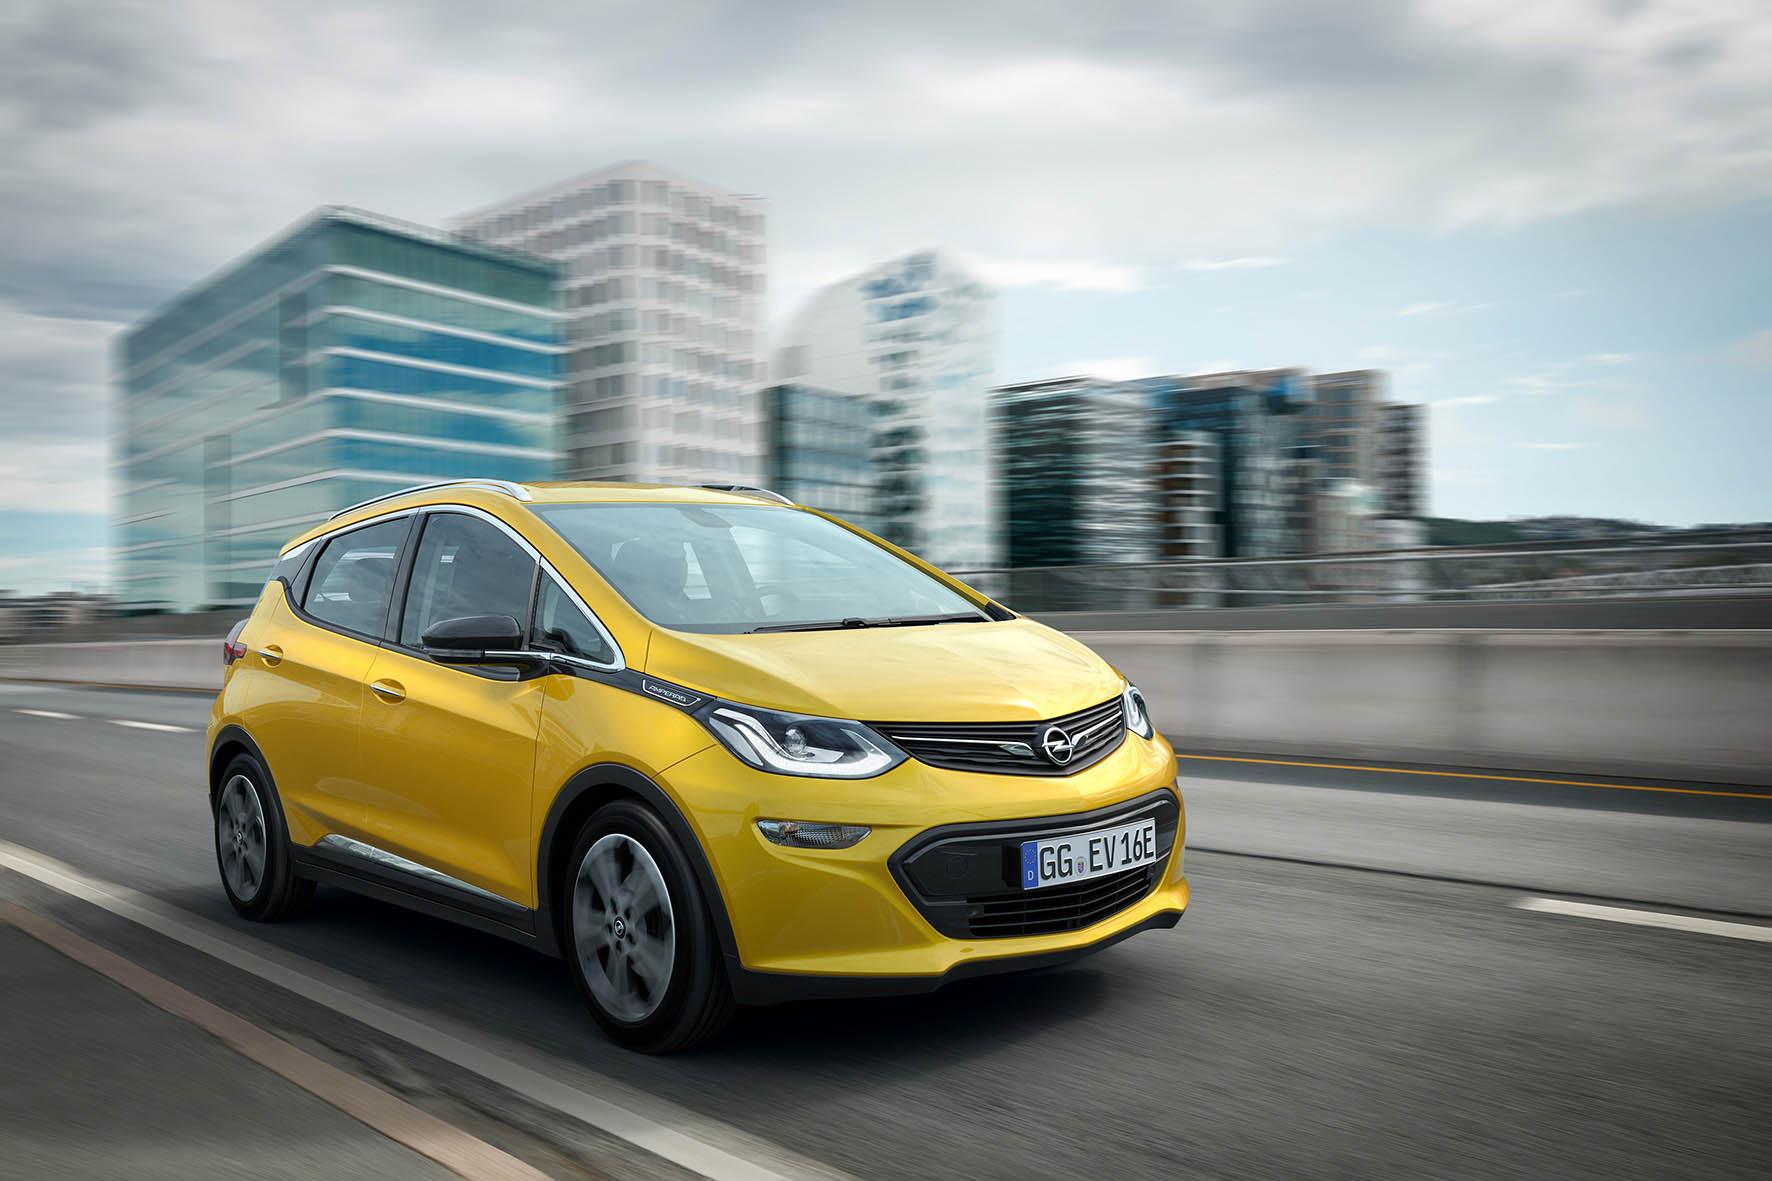 Opel Ampera-e: The Range Champion